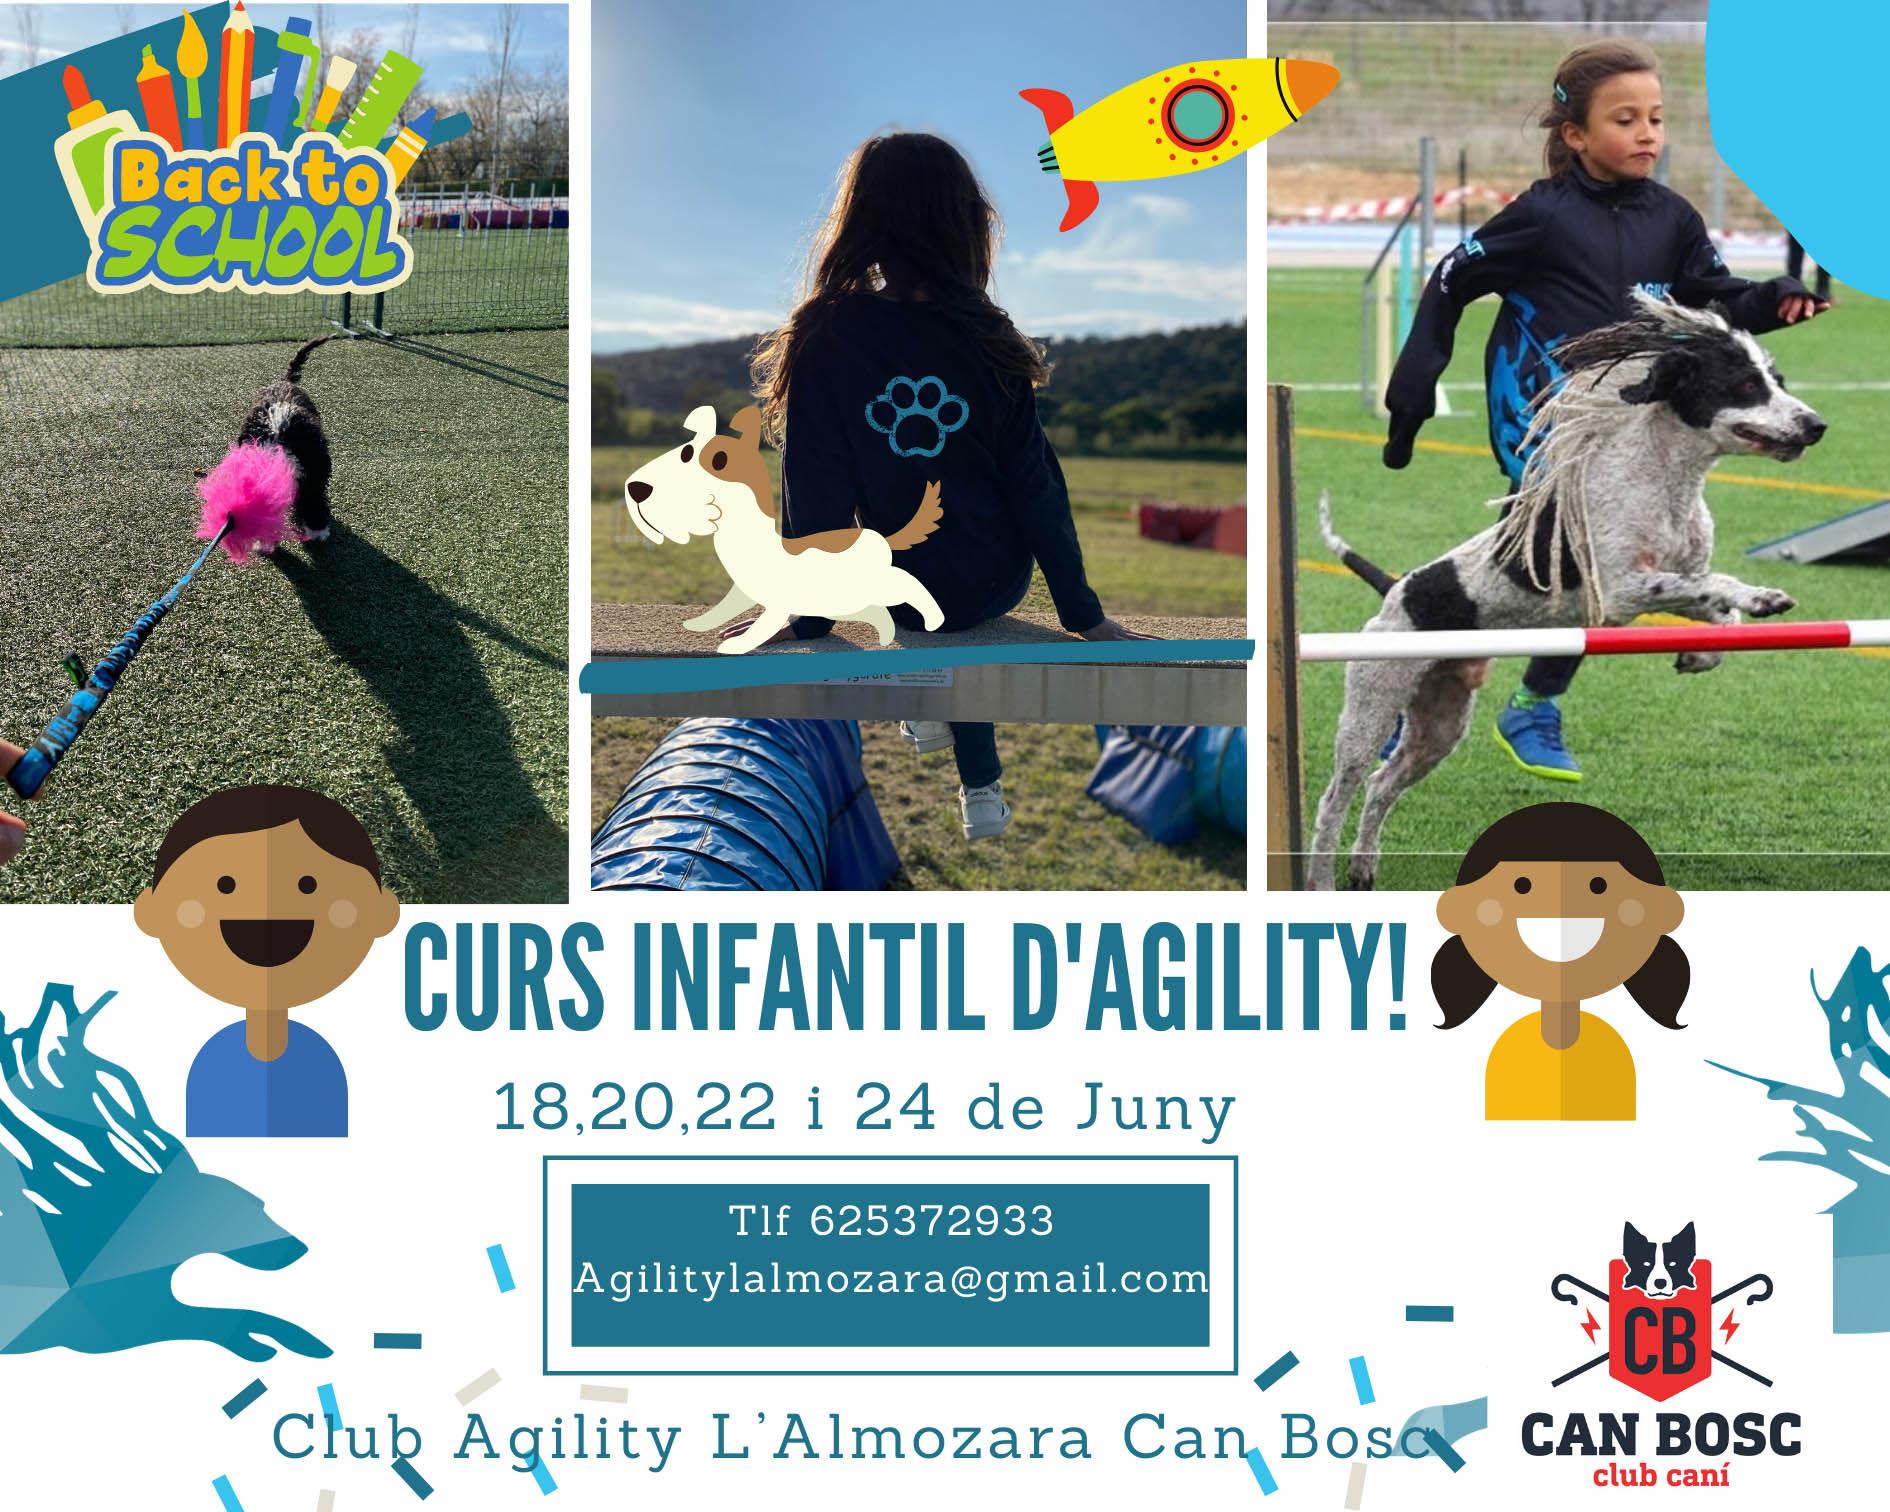 Curso Infantil Agility L'Almozara Can Bosc / 4 días